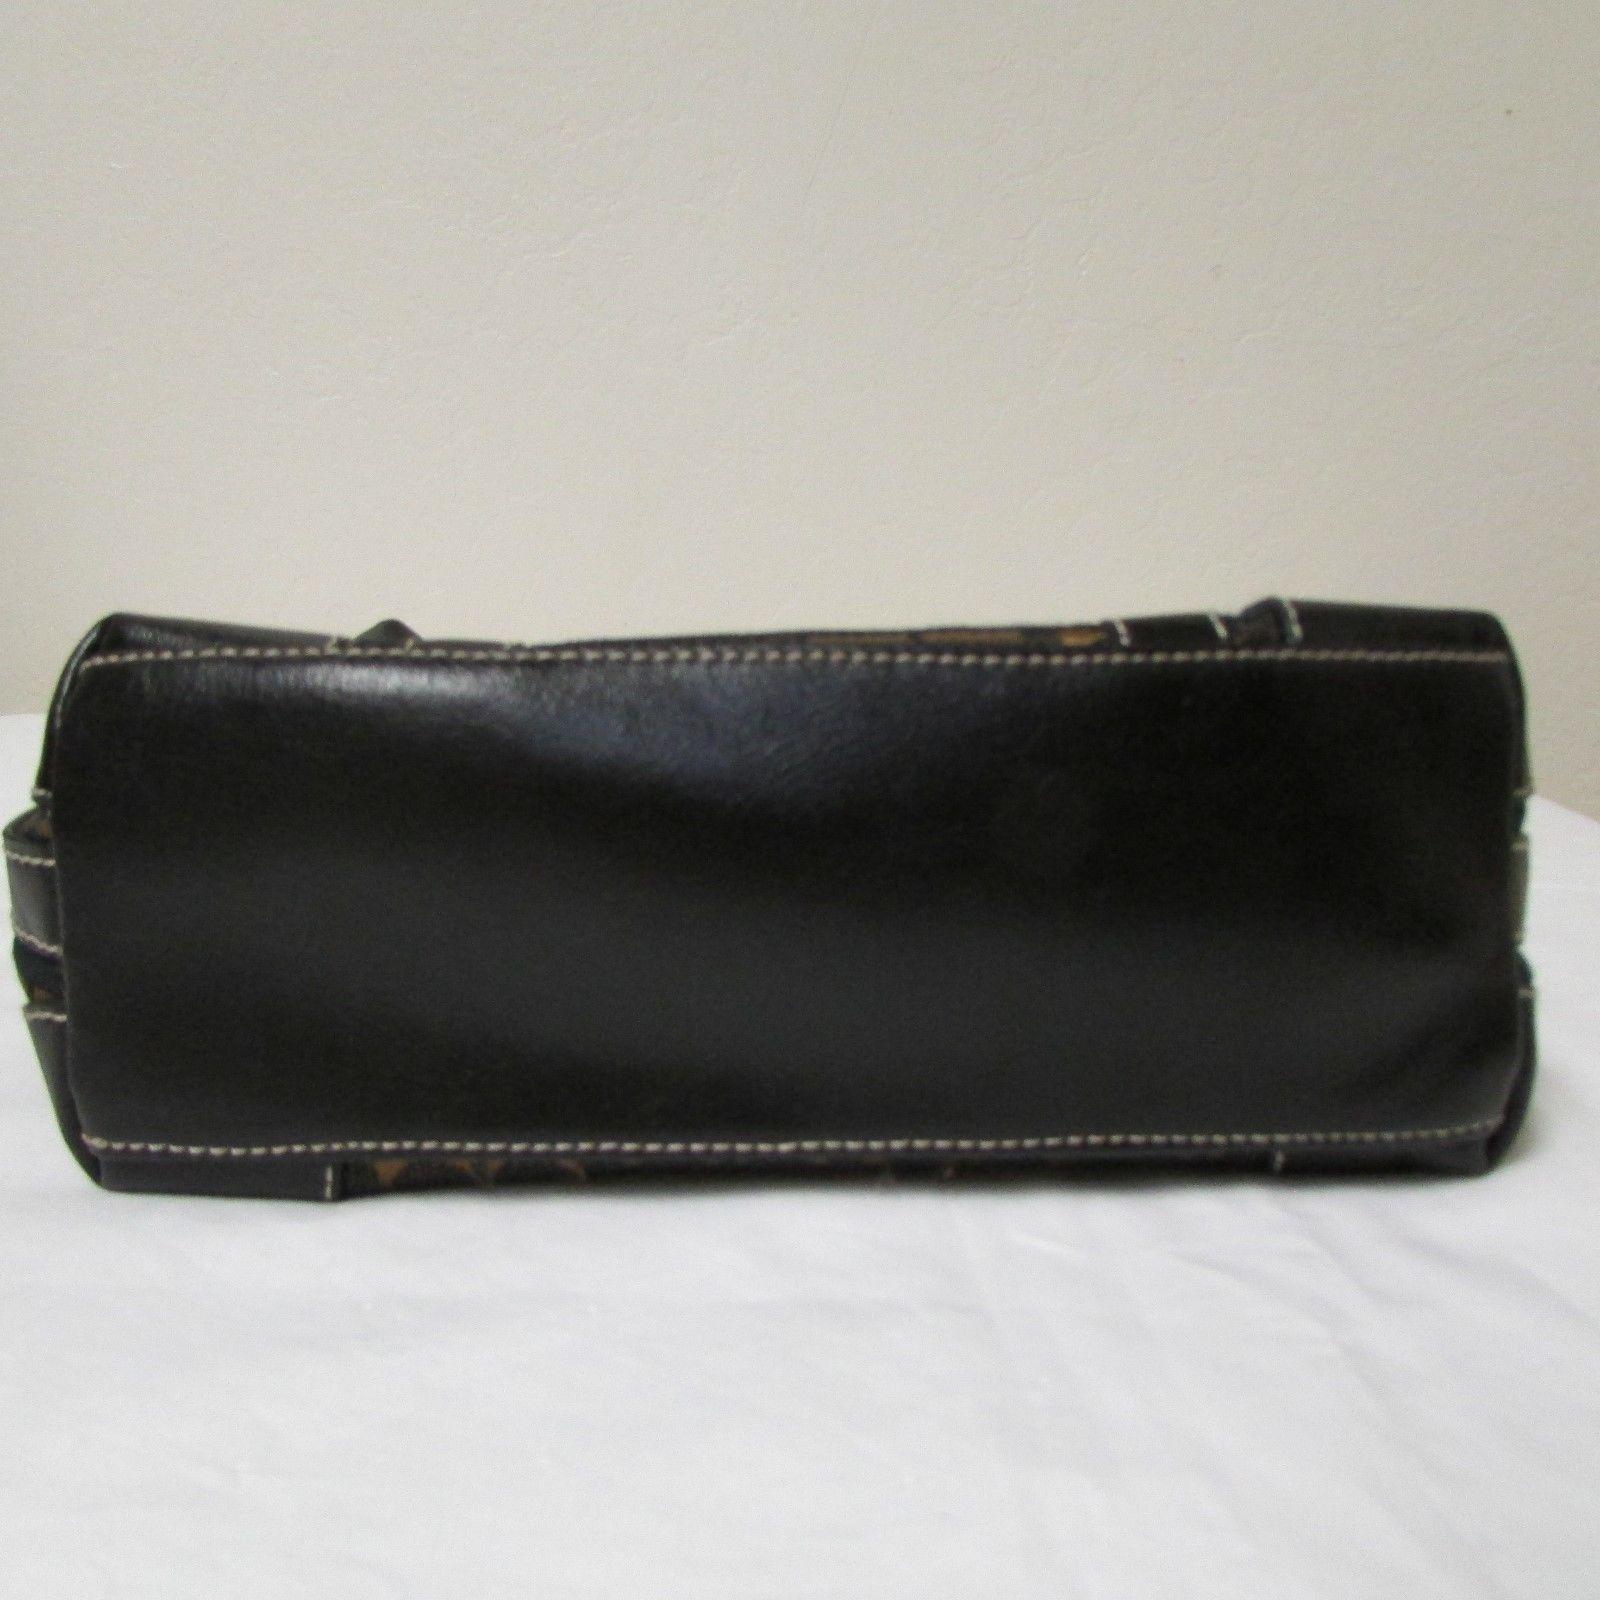 Vintage Liz Claiborne Black With Brown And Gold Fabric Shoulder Handbag Sz S image 4